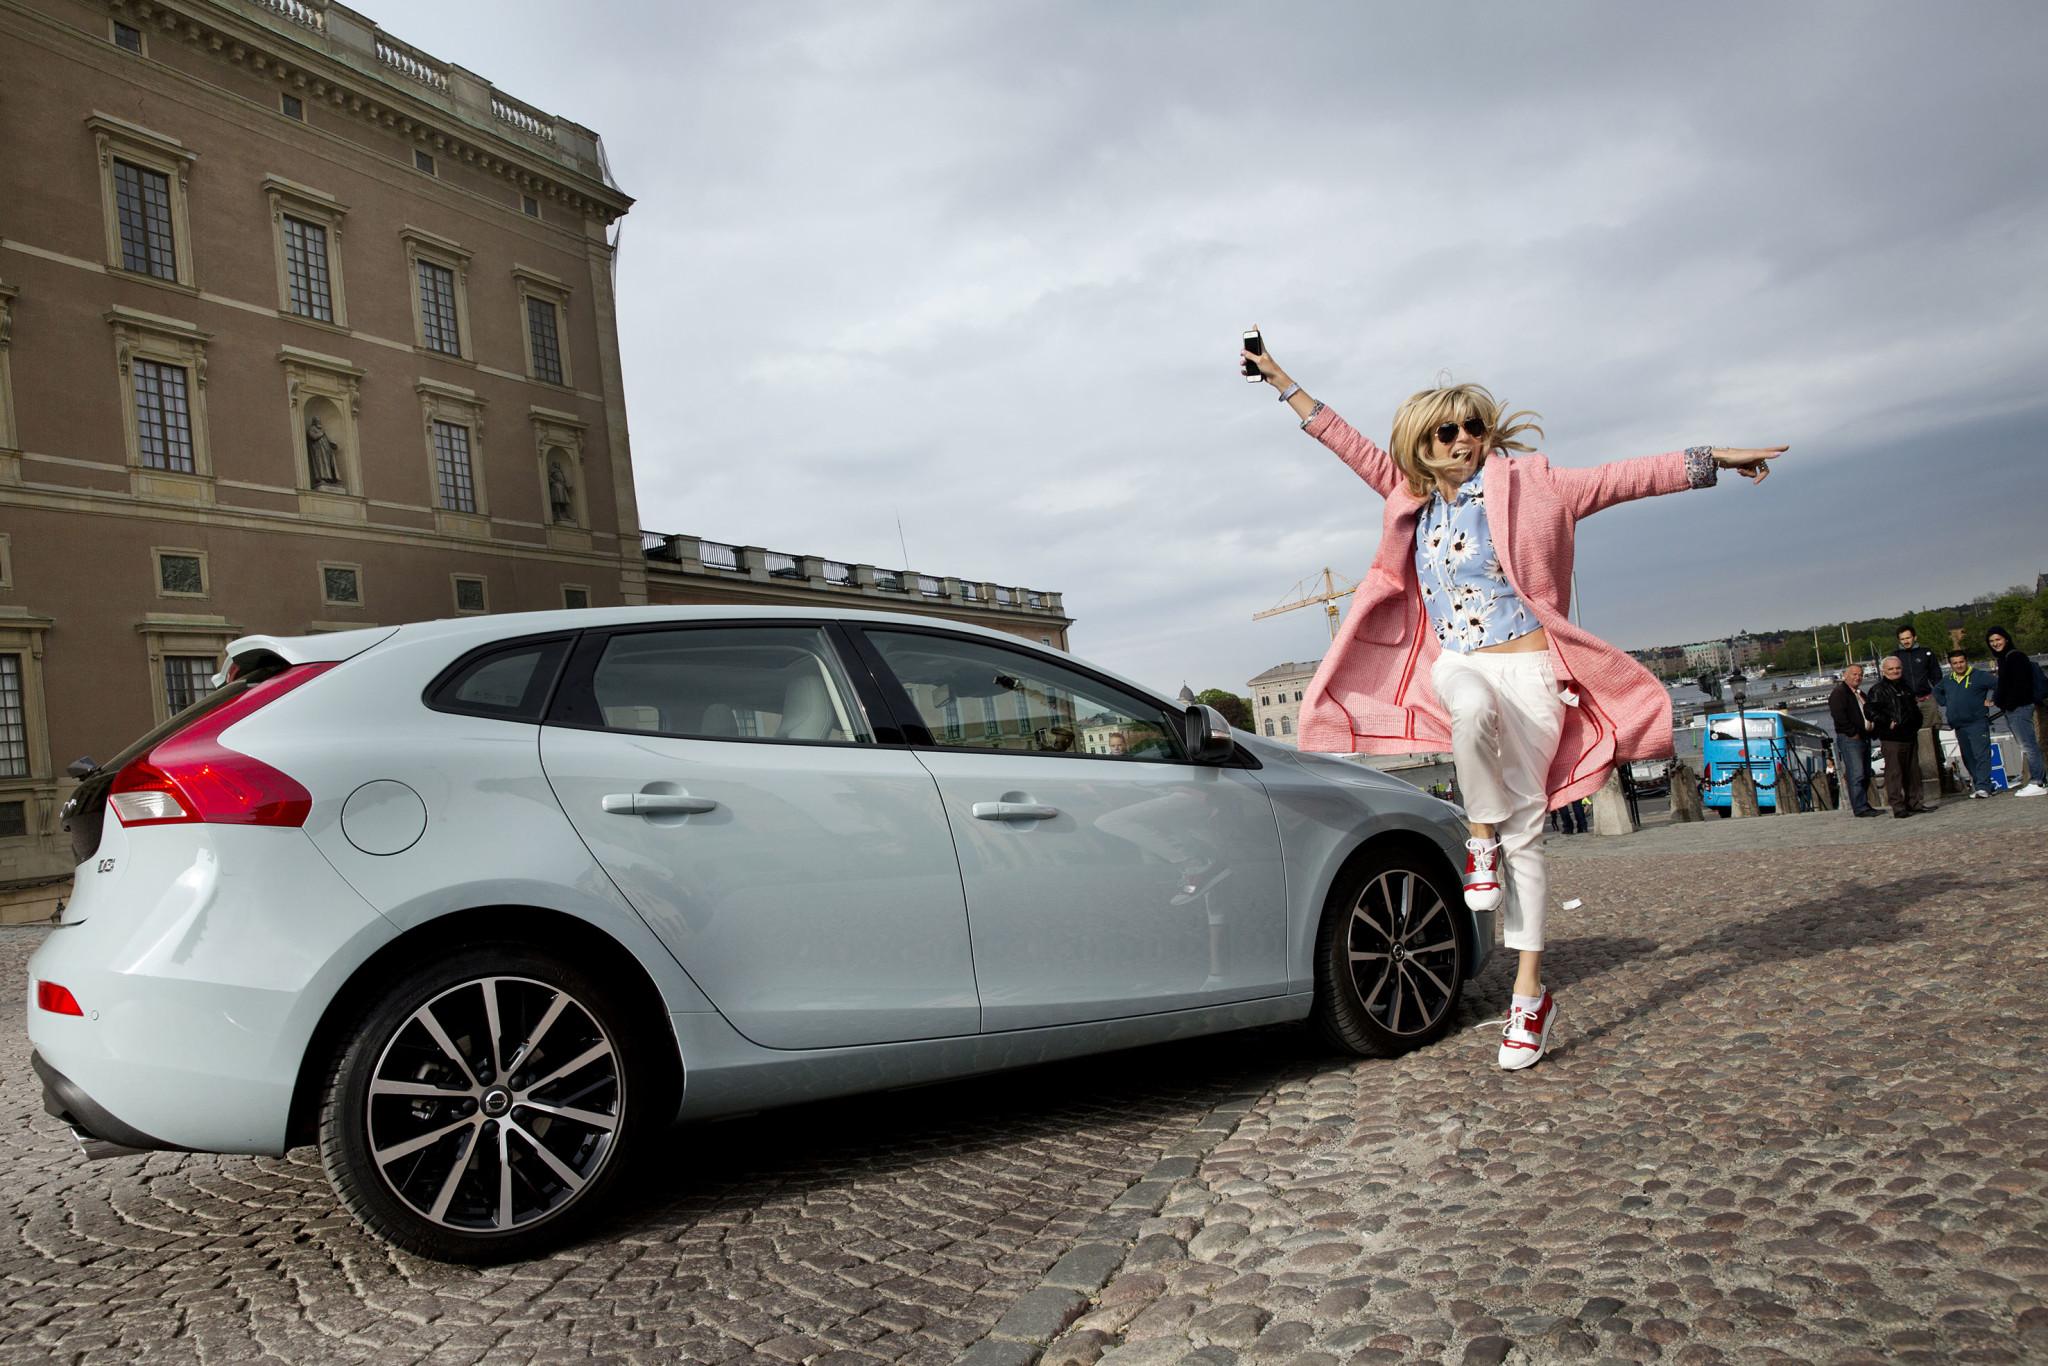 Volvo V40 City Experience. Stockholm Sweden. Bloggers visiting Stockholm. Photo : Rickard Kilström 2016-05-19